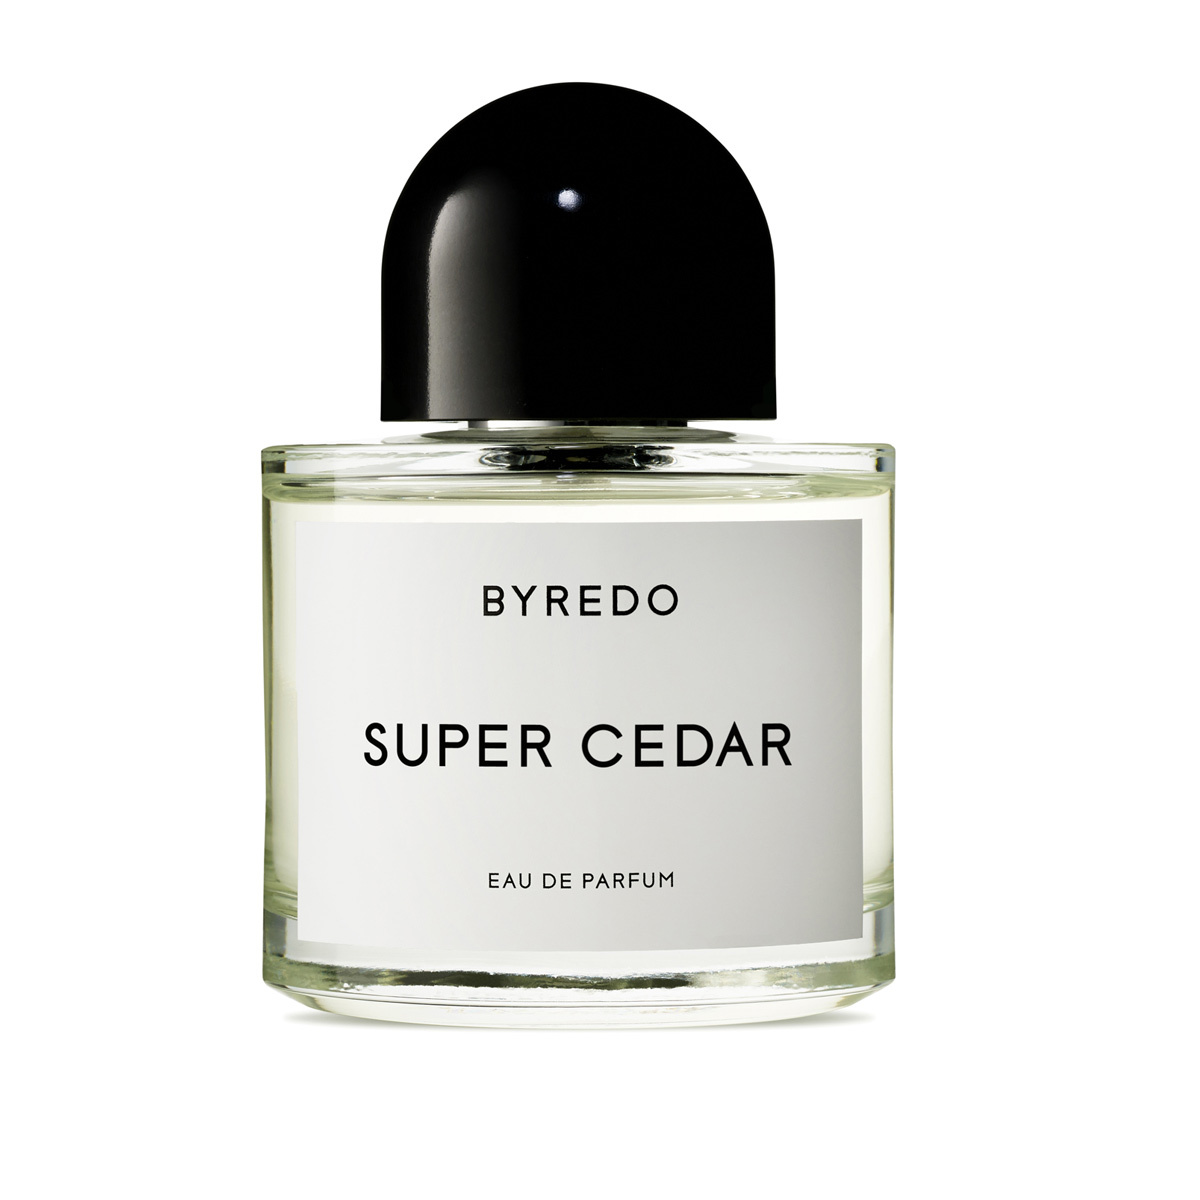 Super Cedar, Byredo.